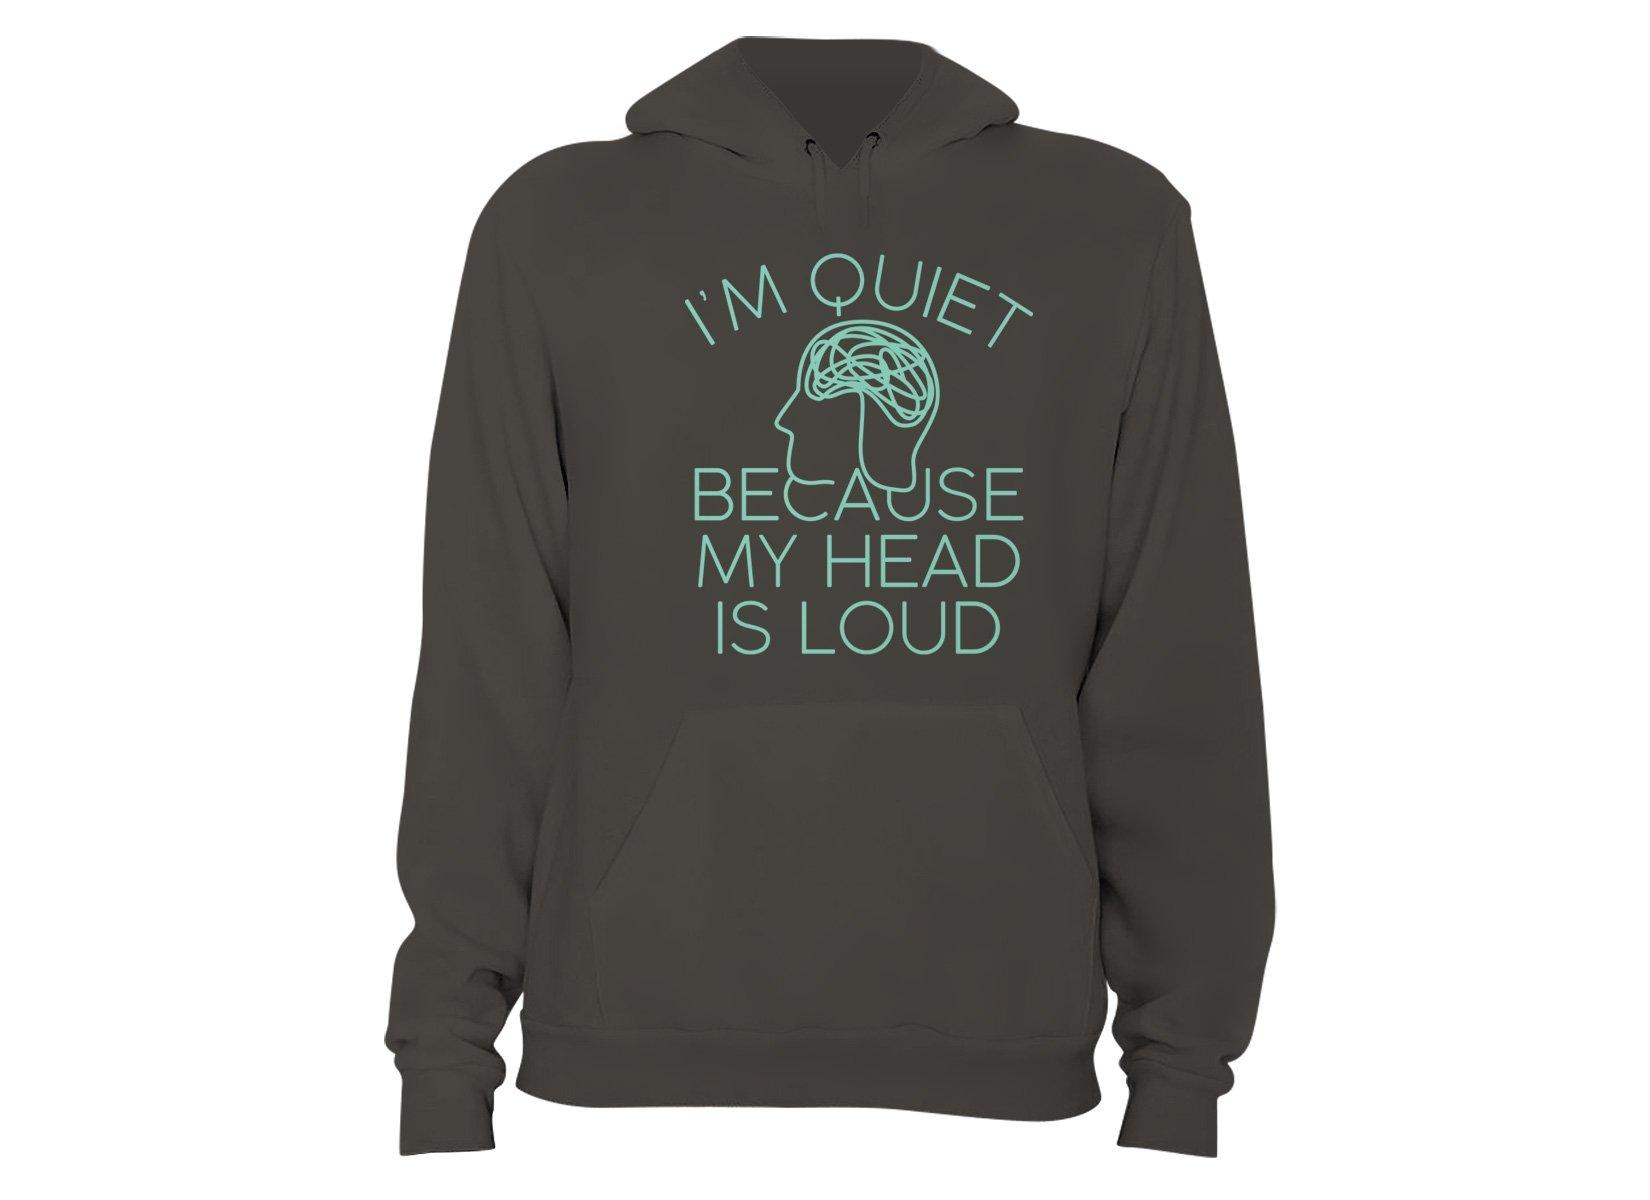 I'm Quiet Because My Head Is Loud on Hoodie